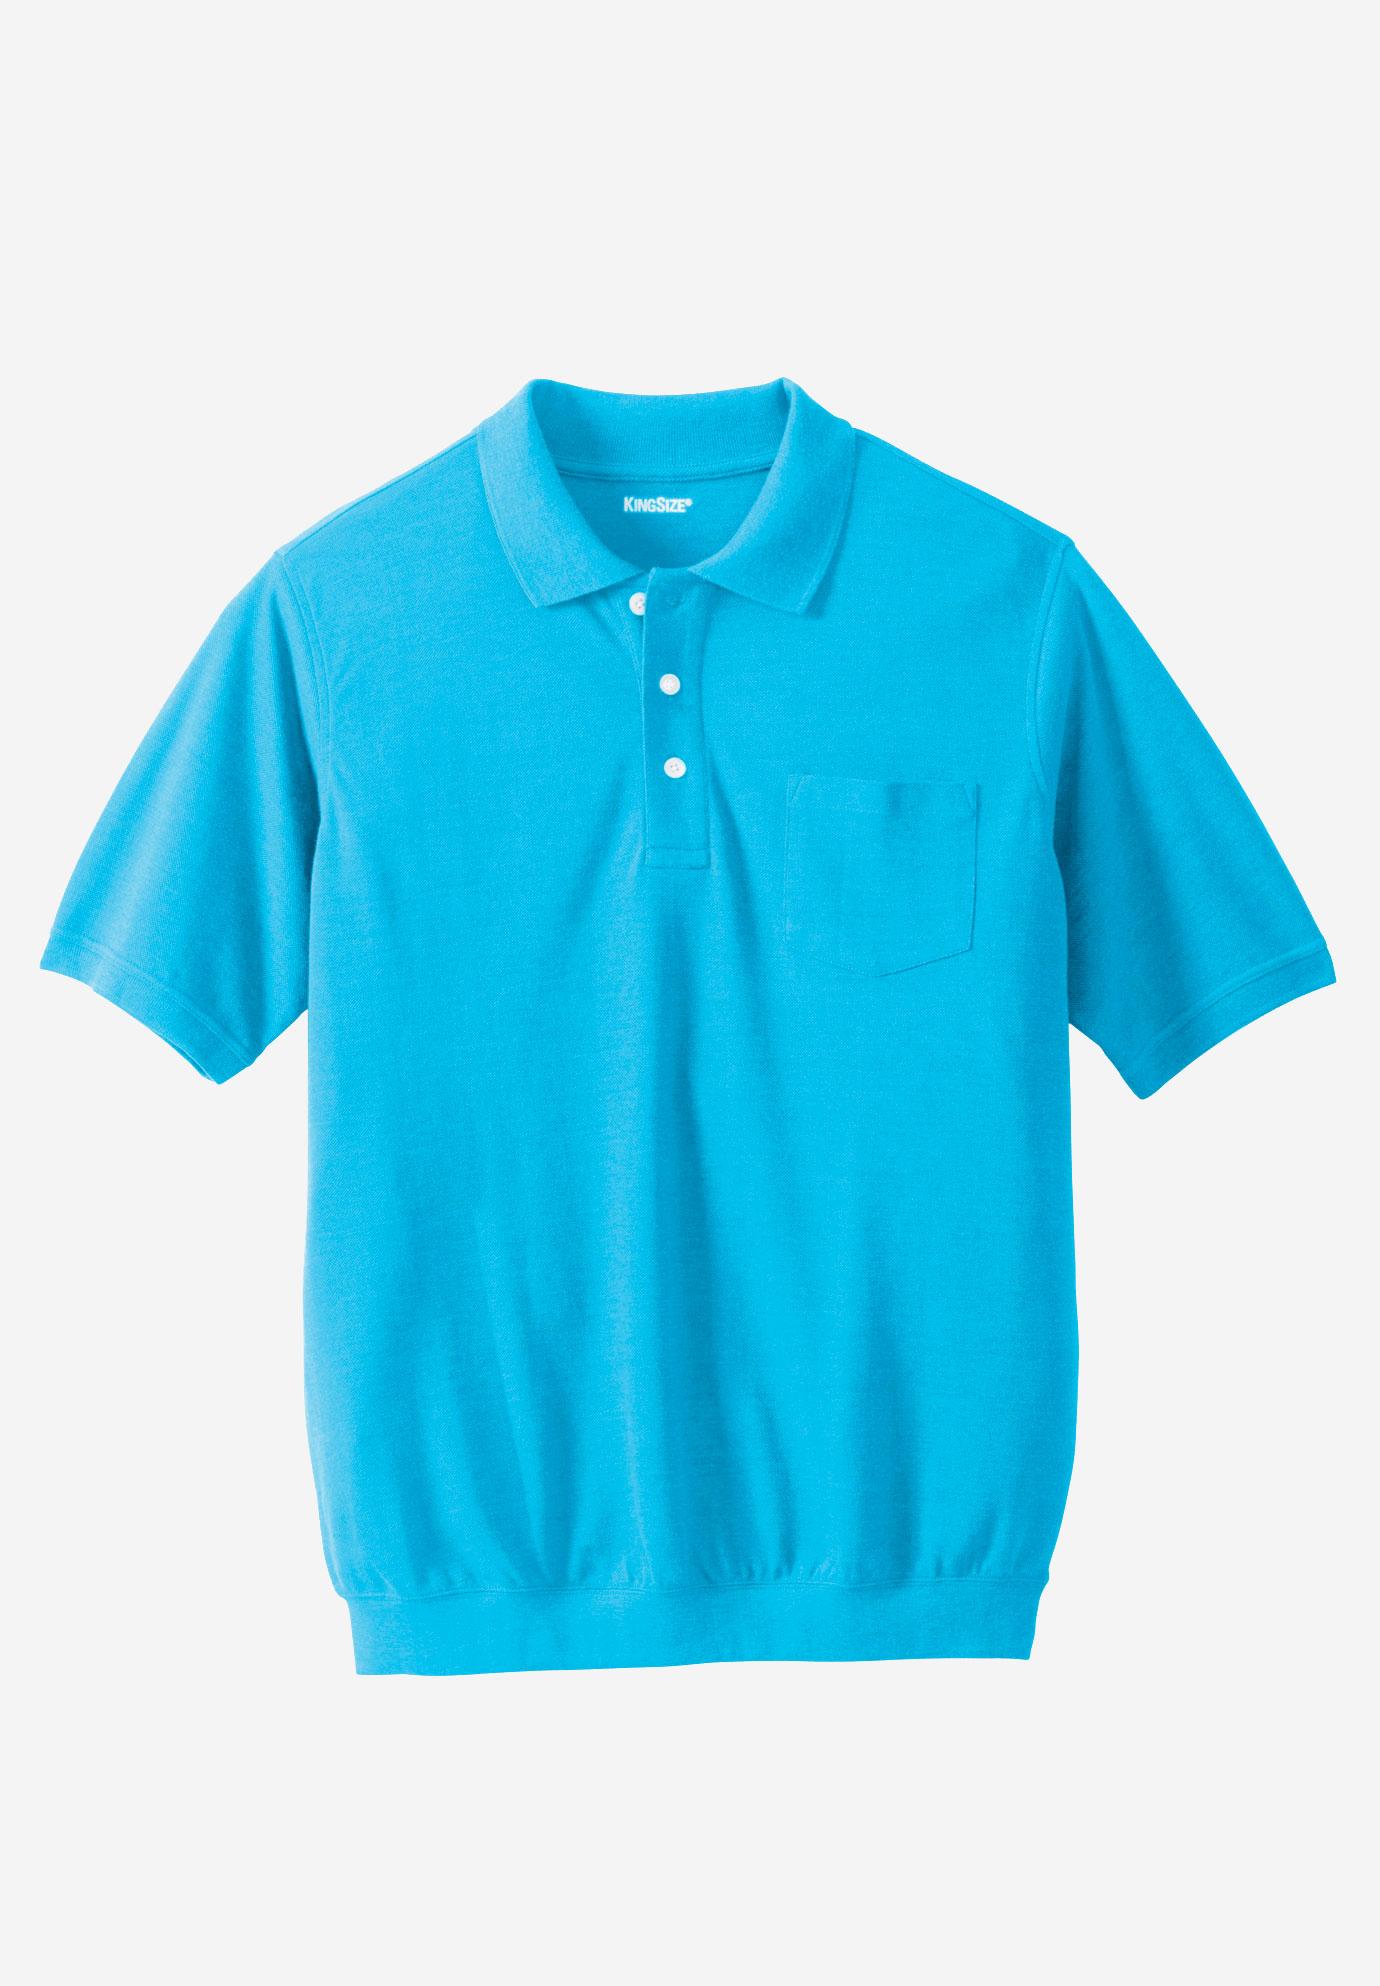 ffb92daad21 Banded Bottom Pocket Piqué Polo Shirt